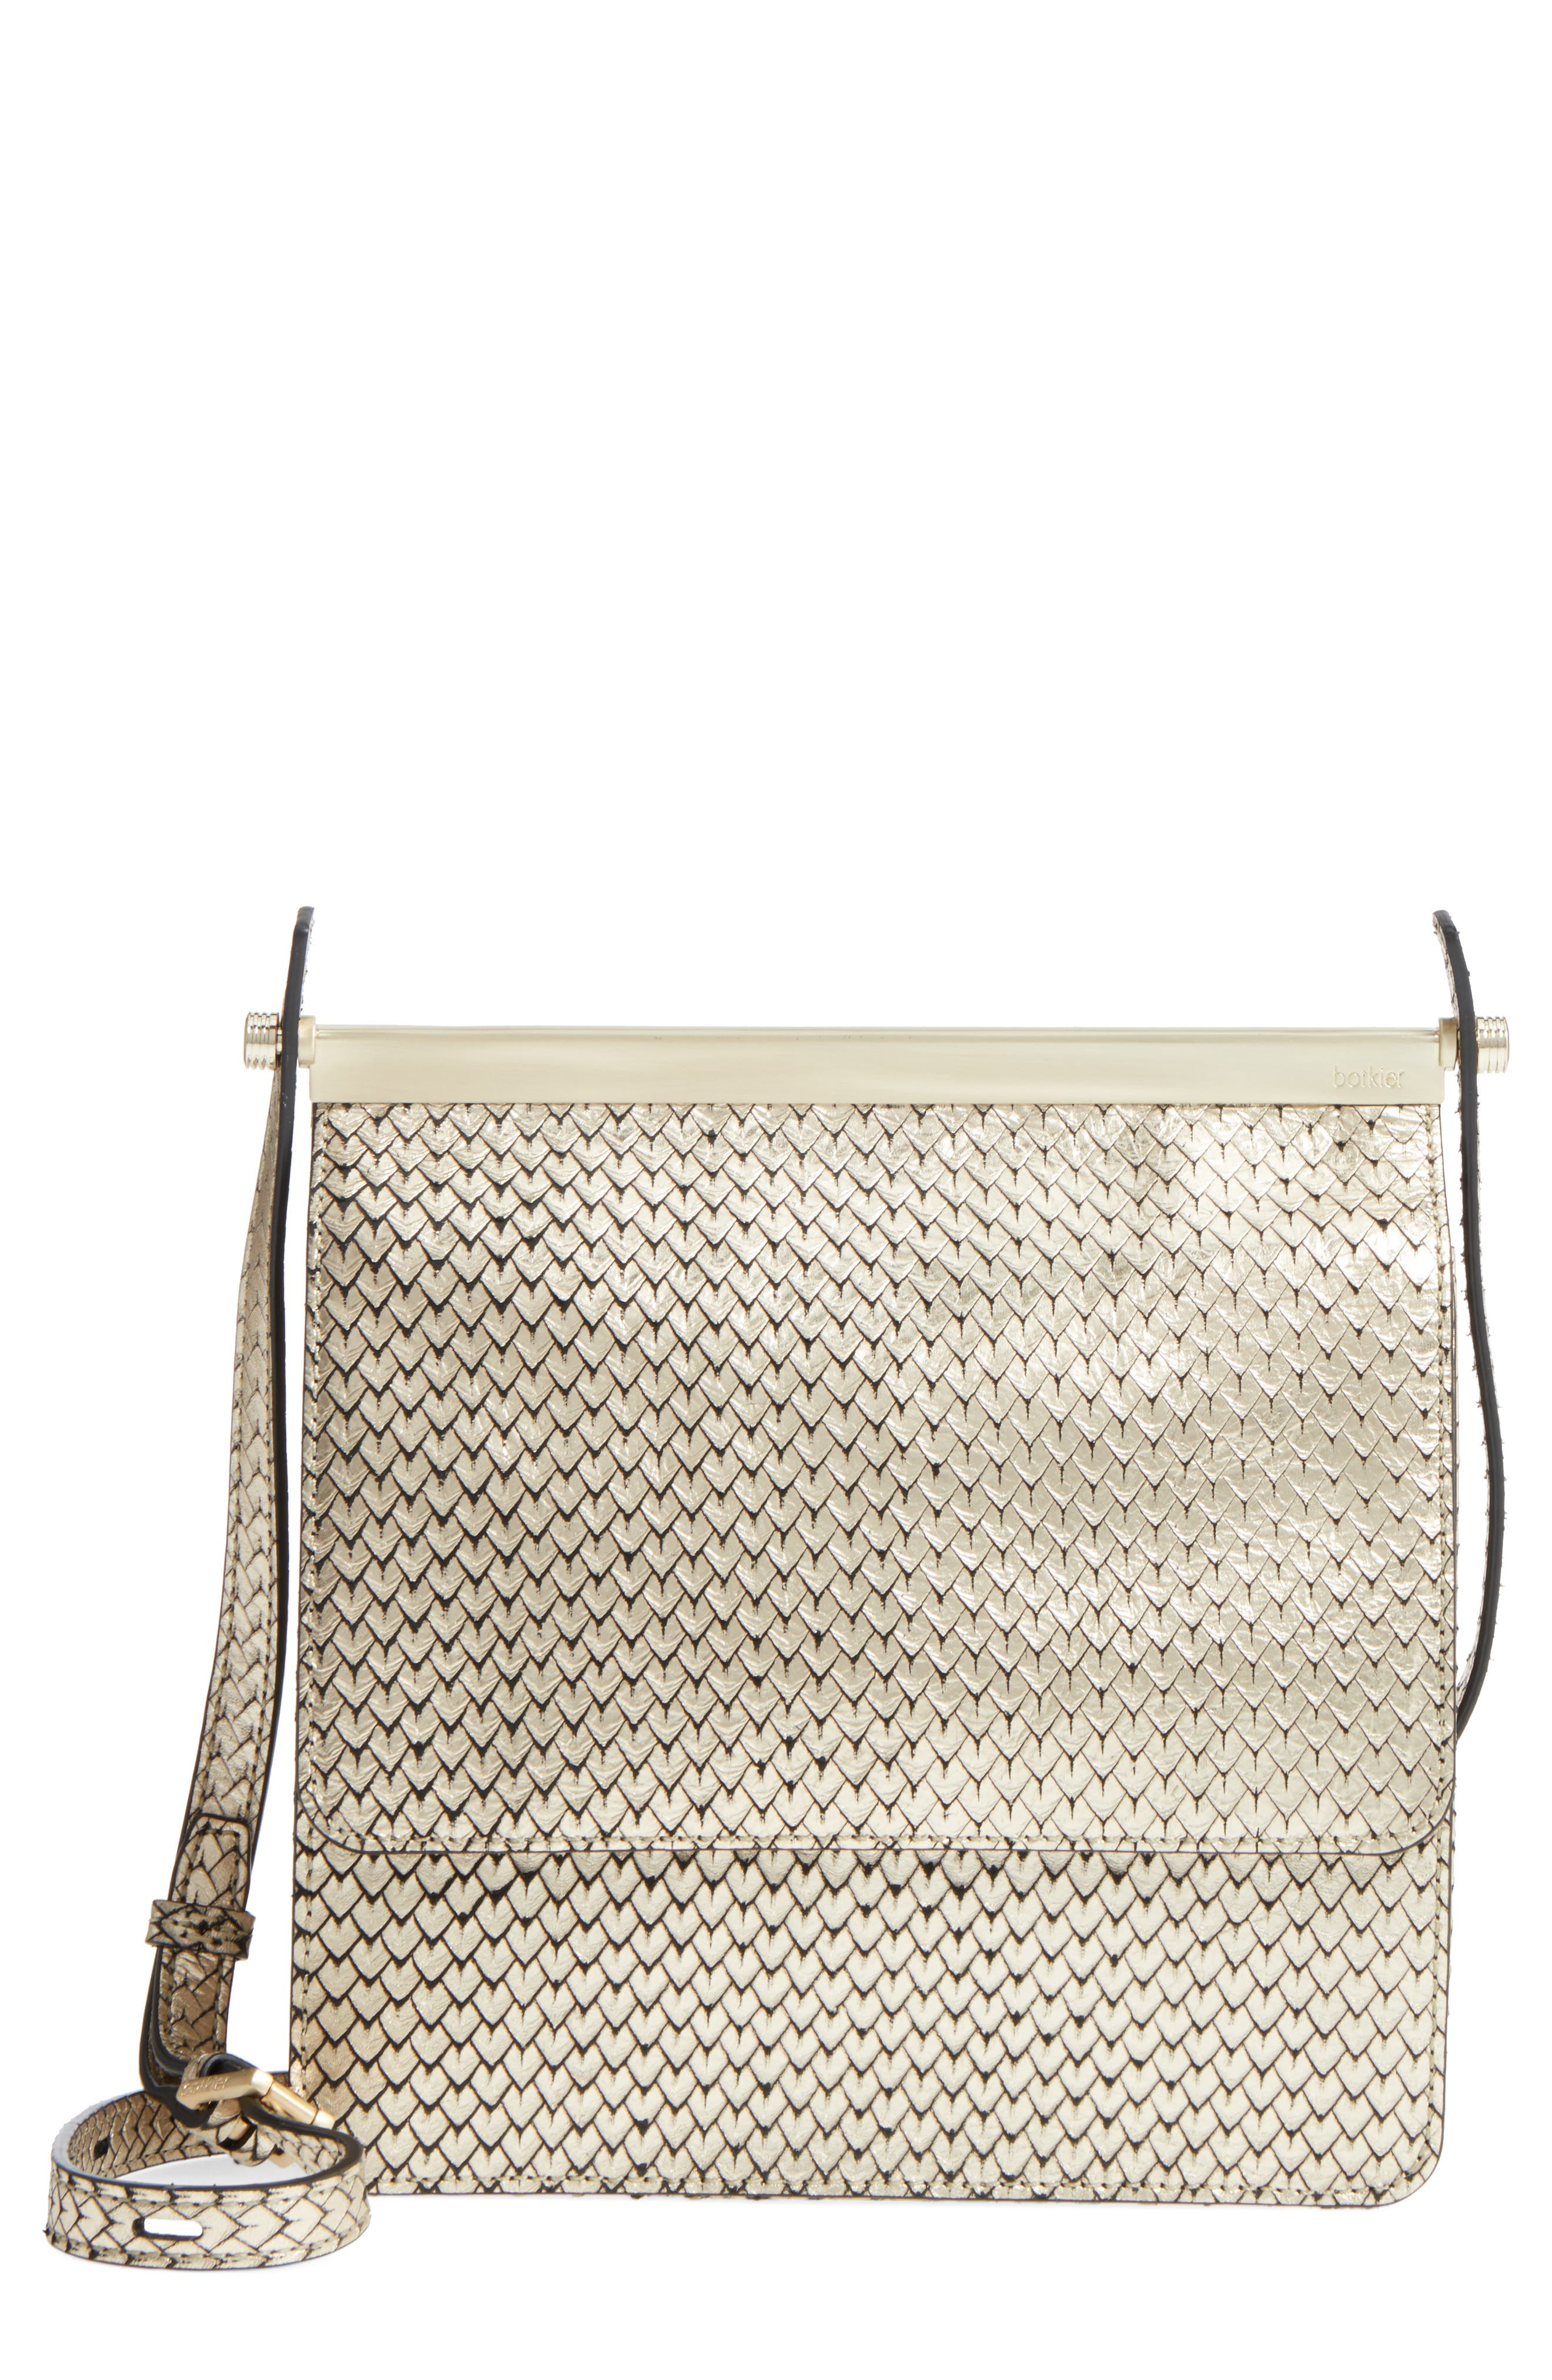 Crawford Calfskin Leather Crossbody Bag,                         Main,                         color, Gold